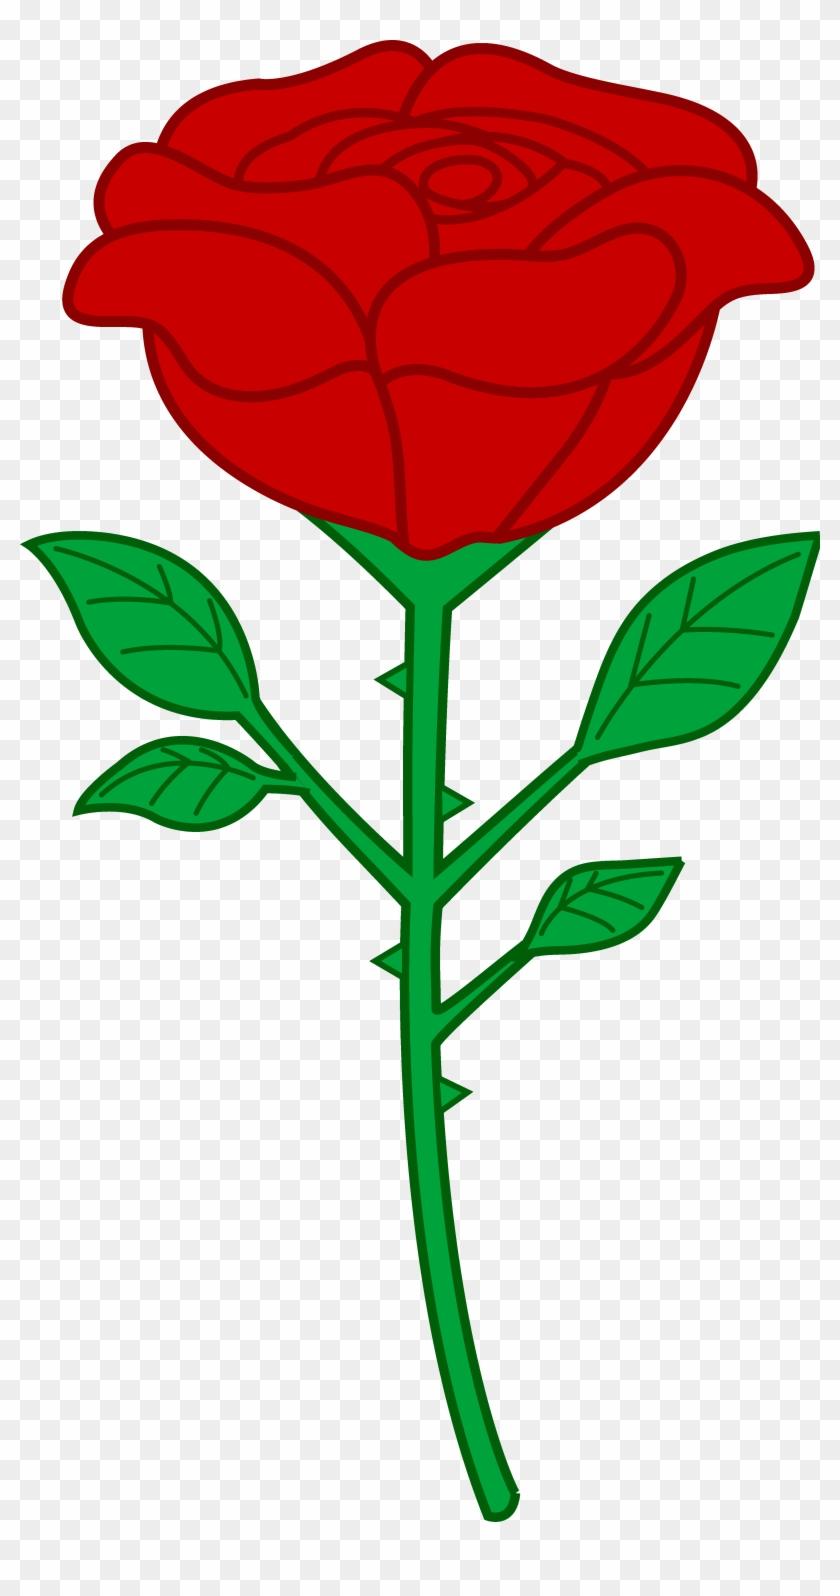 Petal Clipart Rose Stem - Cartoon Rose #8163